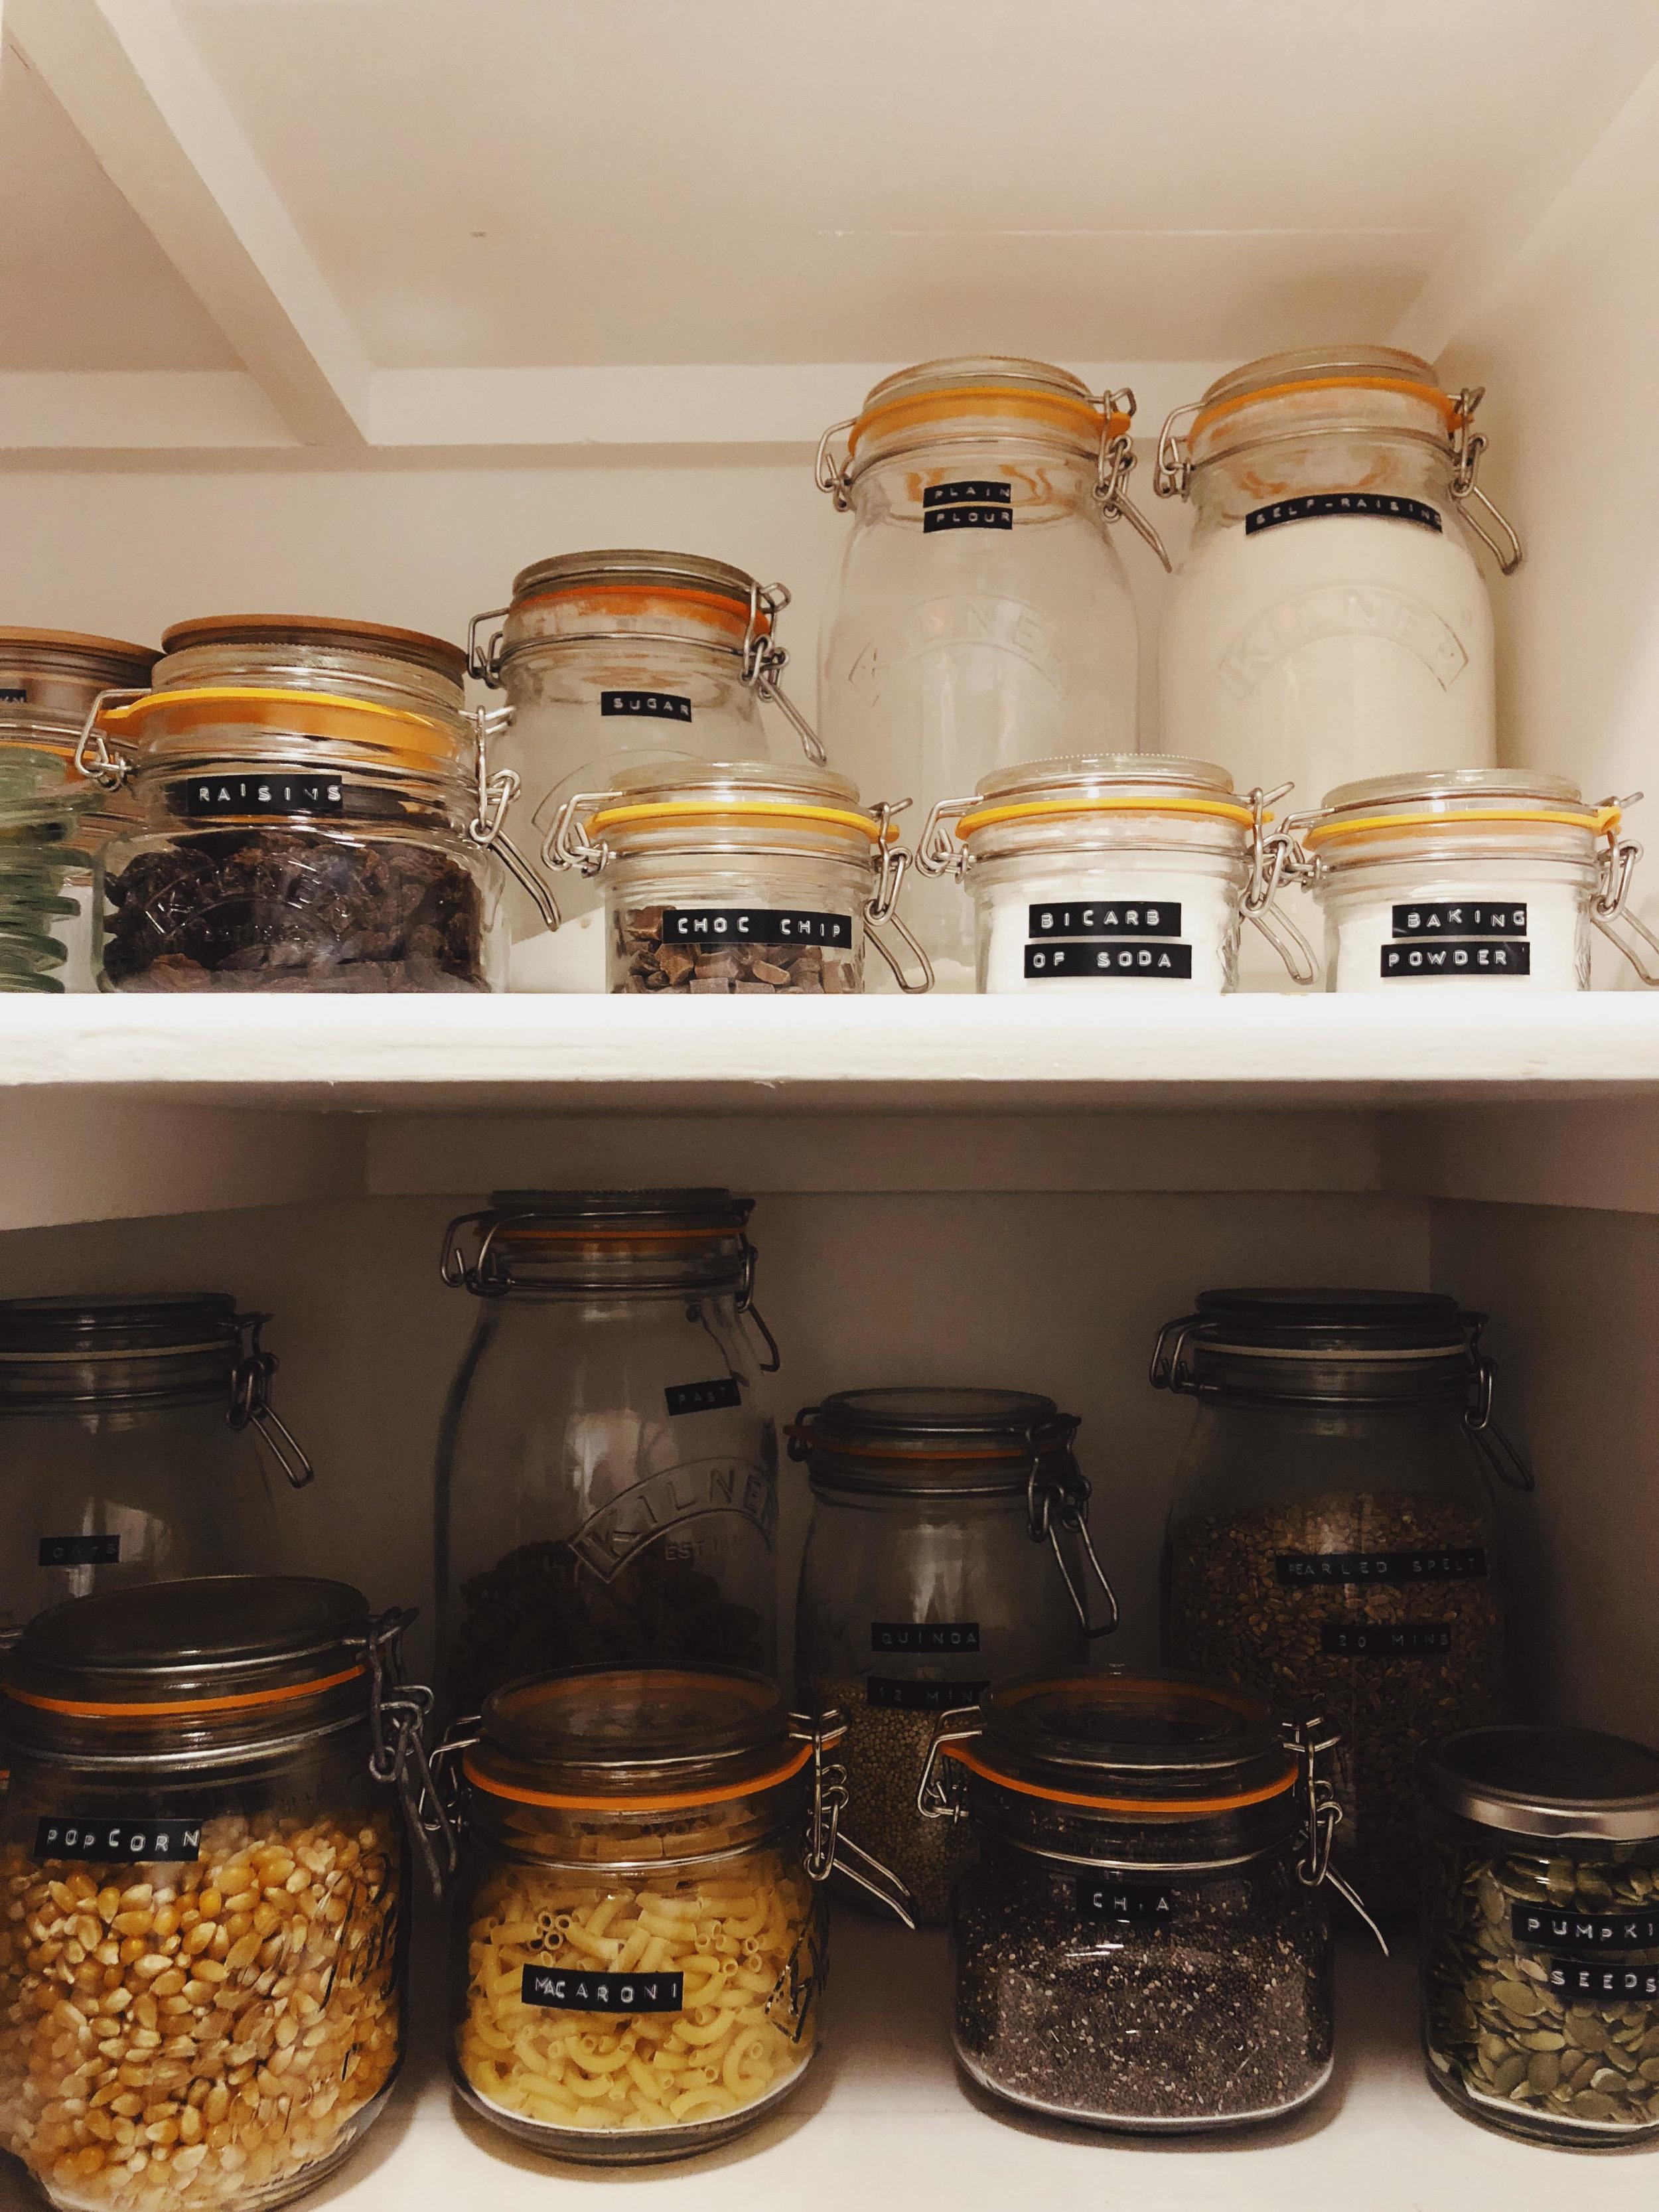 larder cupboard shelf larder storage kilner jars walk-in pantry larder cupboard pantry larder larder organisation storage shelves tiny kitchen maximise space 70 foot square kitchen ourstorytime.co.uk